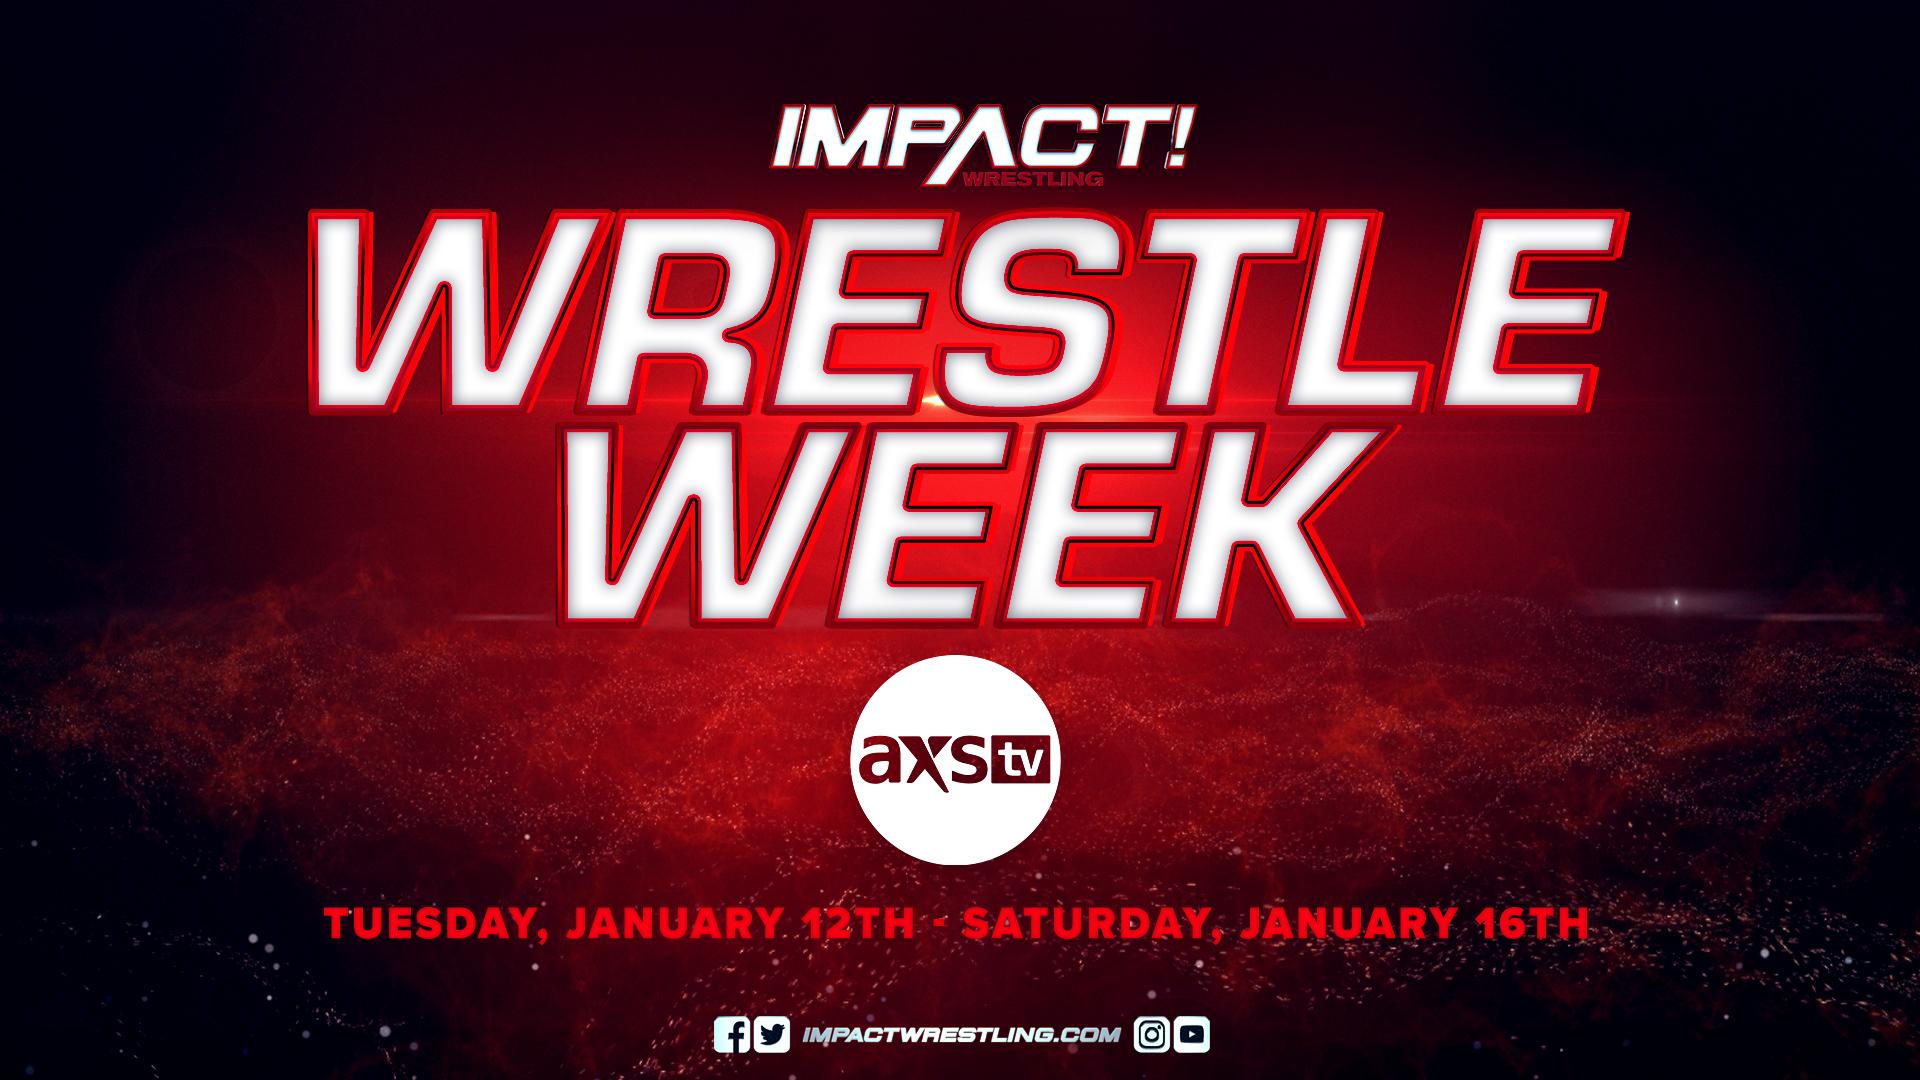 AXS TV AND IMPACT WRESTLING PRESENT WRESTLE WEEK – IMPACT Wrestling